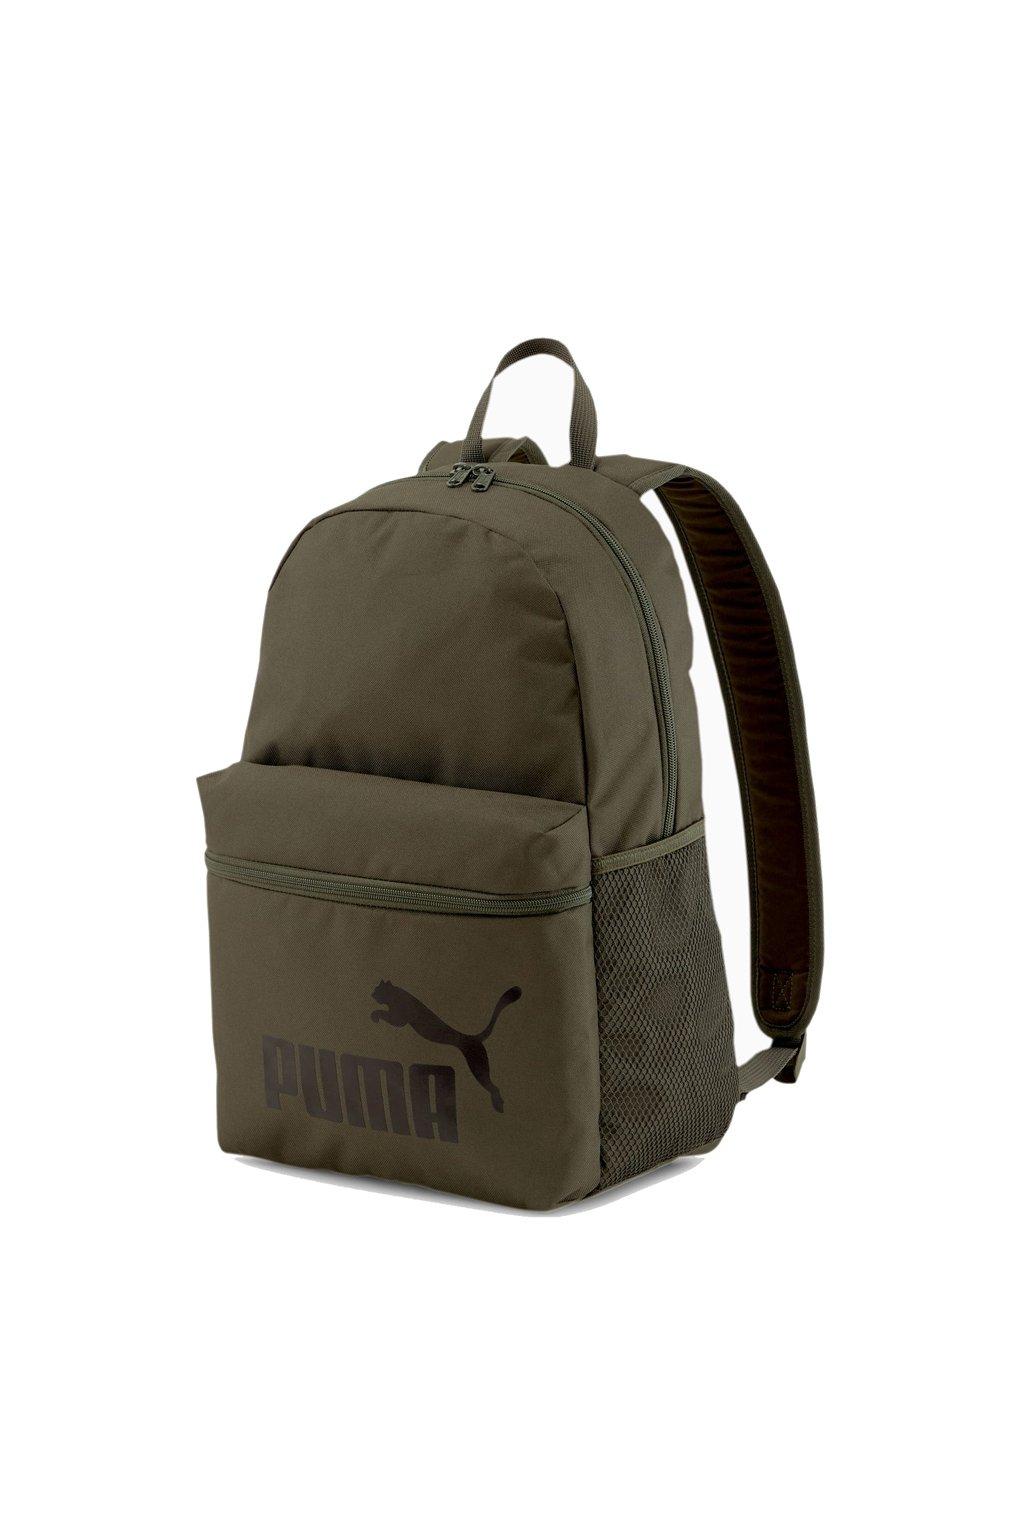 Batoh Puma Phase Backpack zelený 075487 47